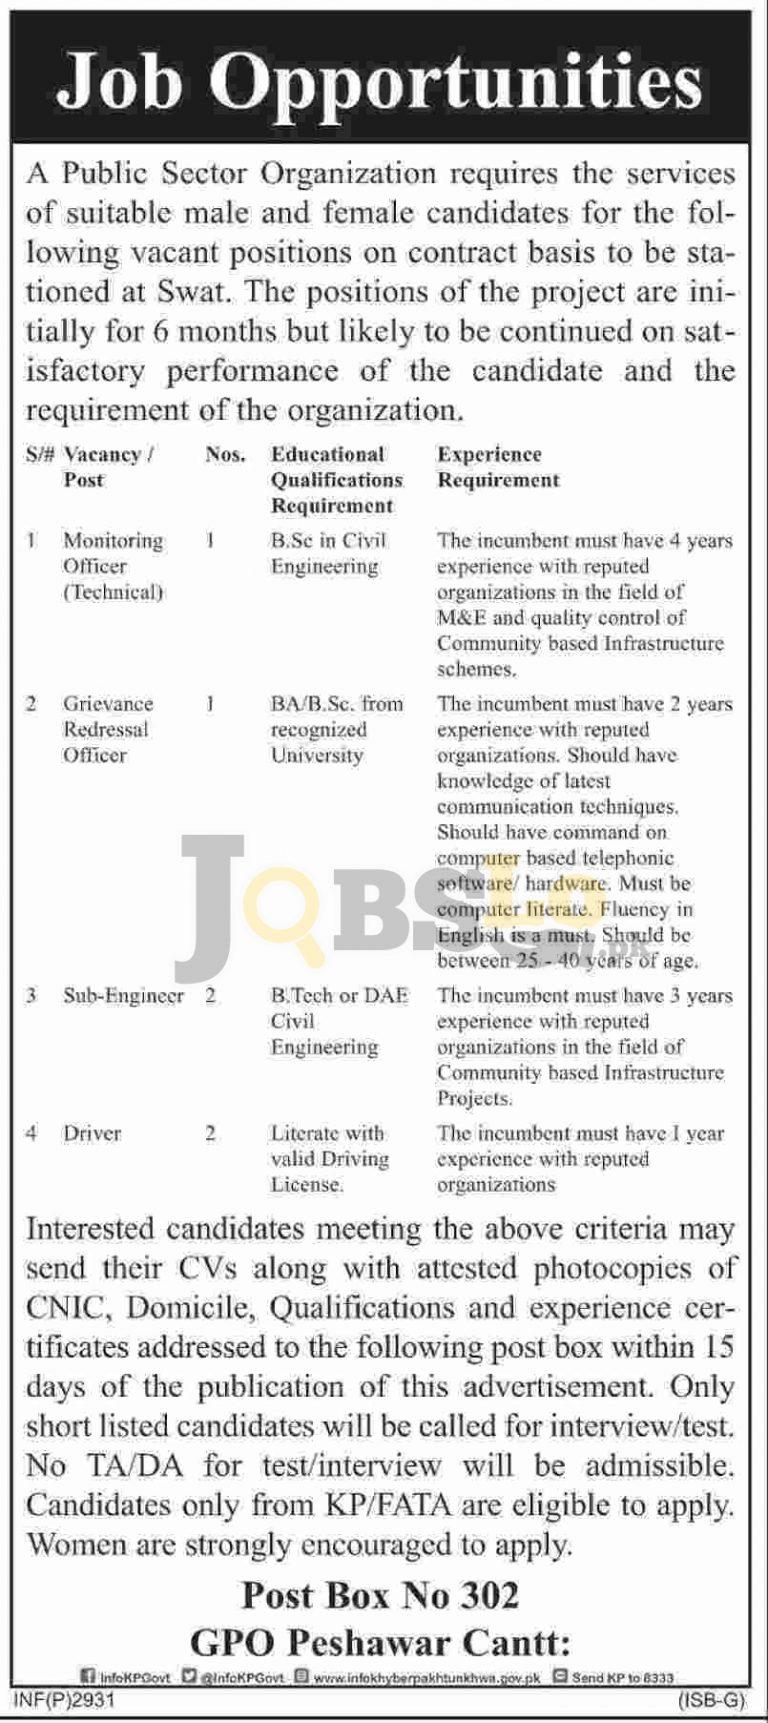 KPK Public Sector Organization Jobs 2016 For Monitoring Officer (Technical)